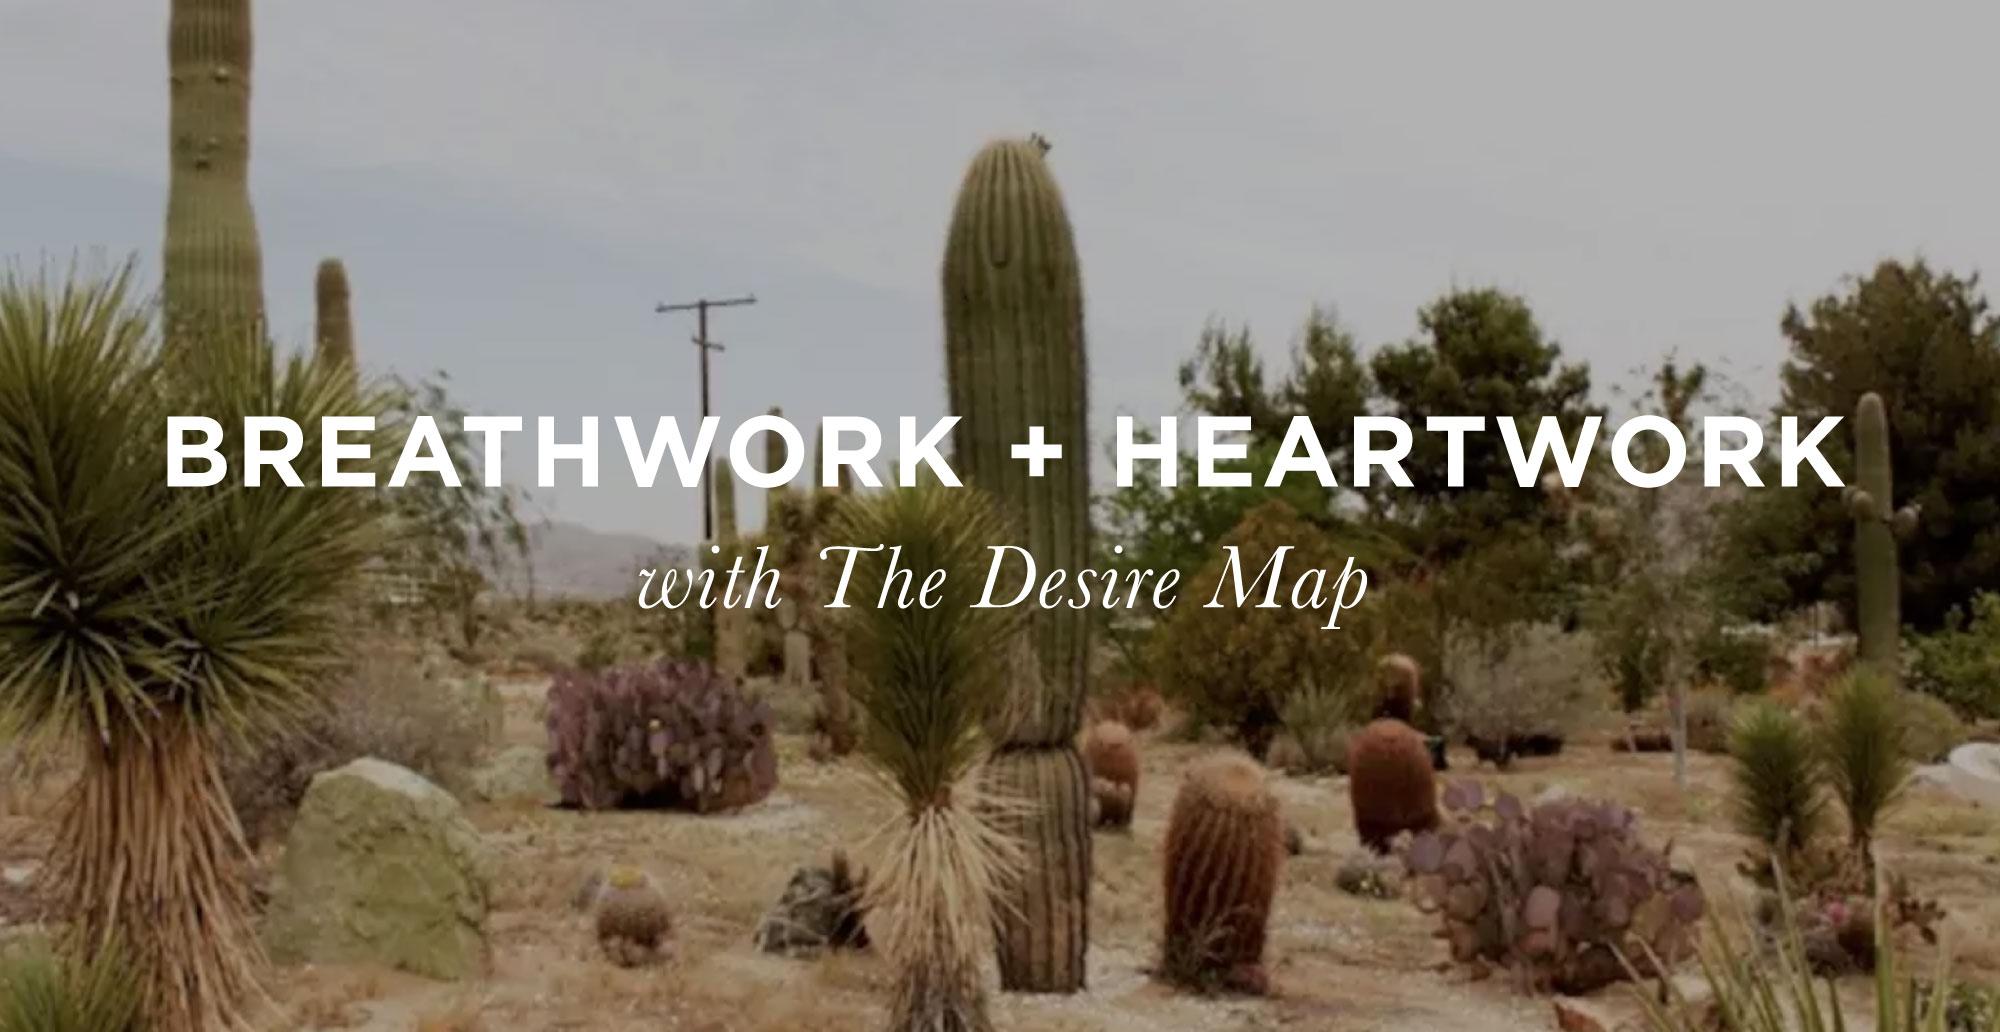 Breathwork + Heartwork with The Desire Map in Joshua Tree